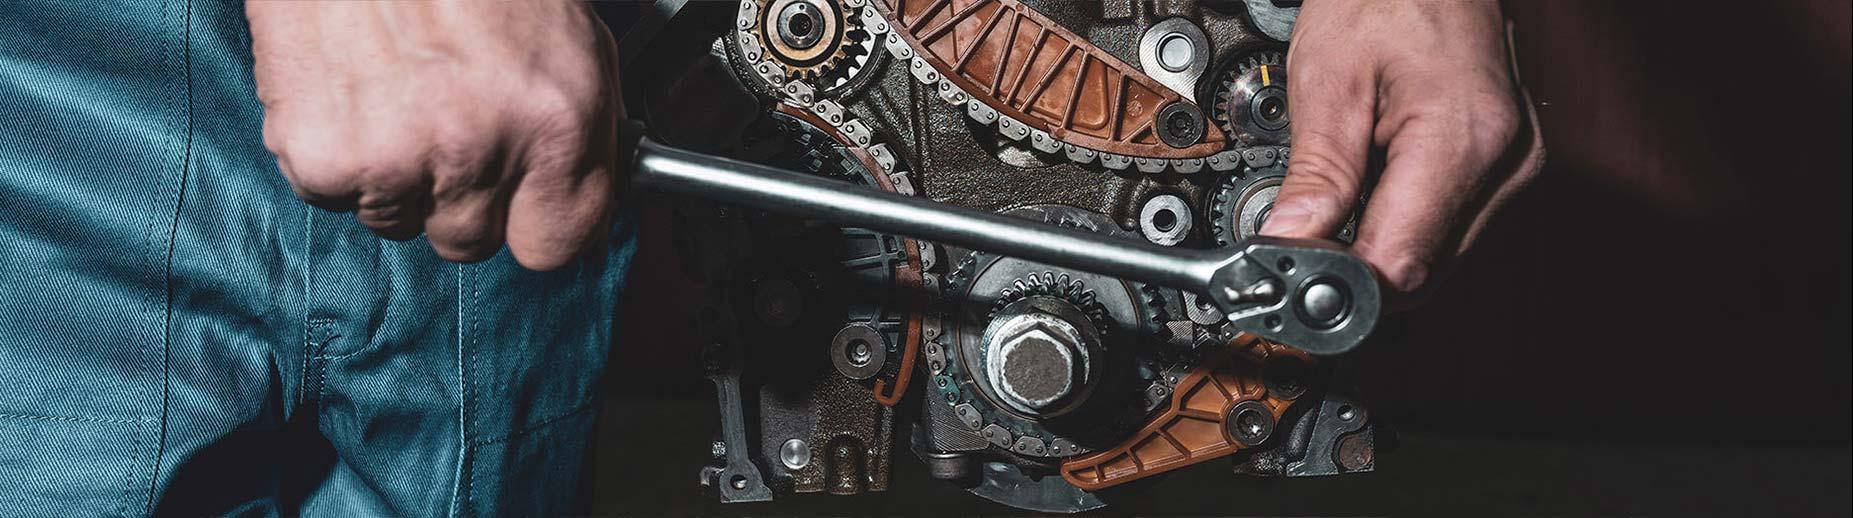 Palm Beach Gardens Auto Repair, Auto Mechanic and Auto Body Shop